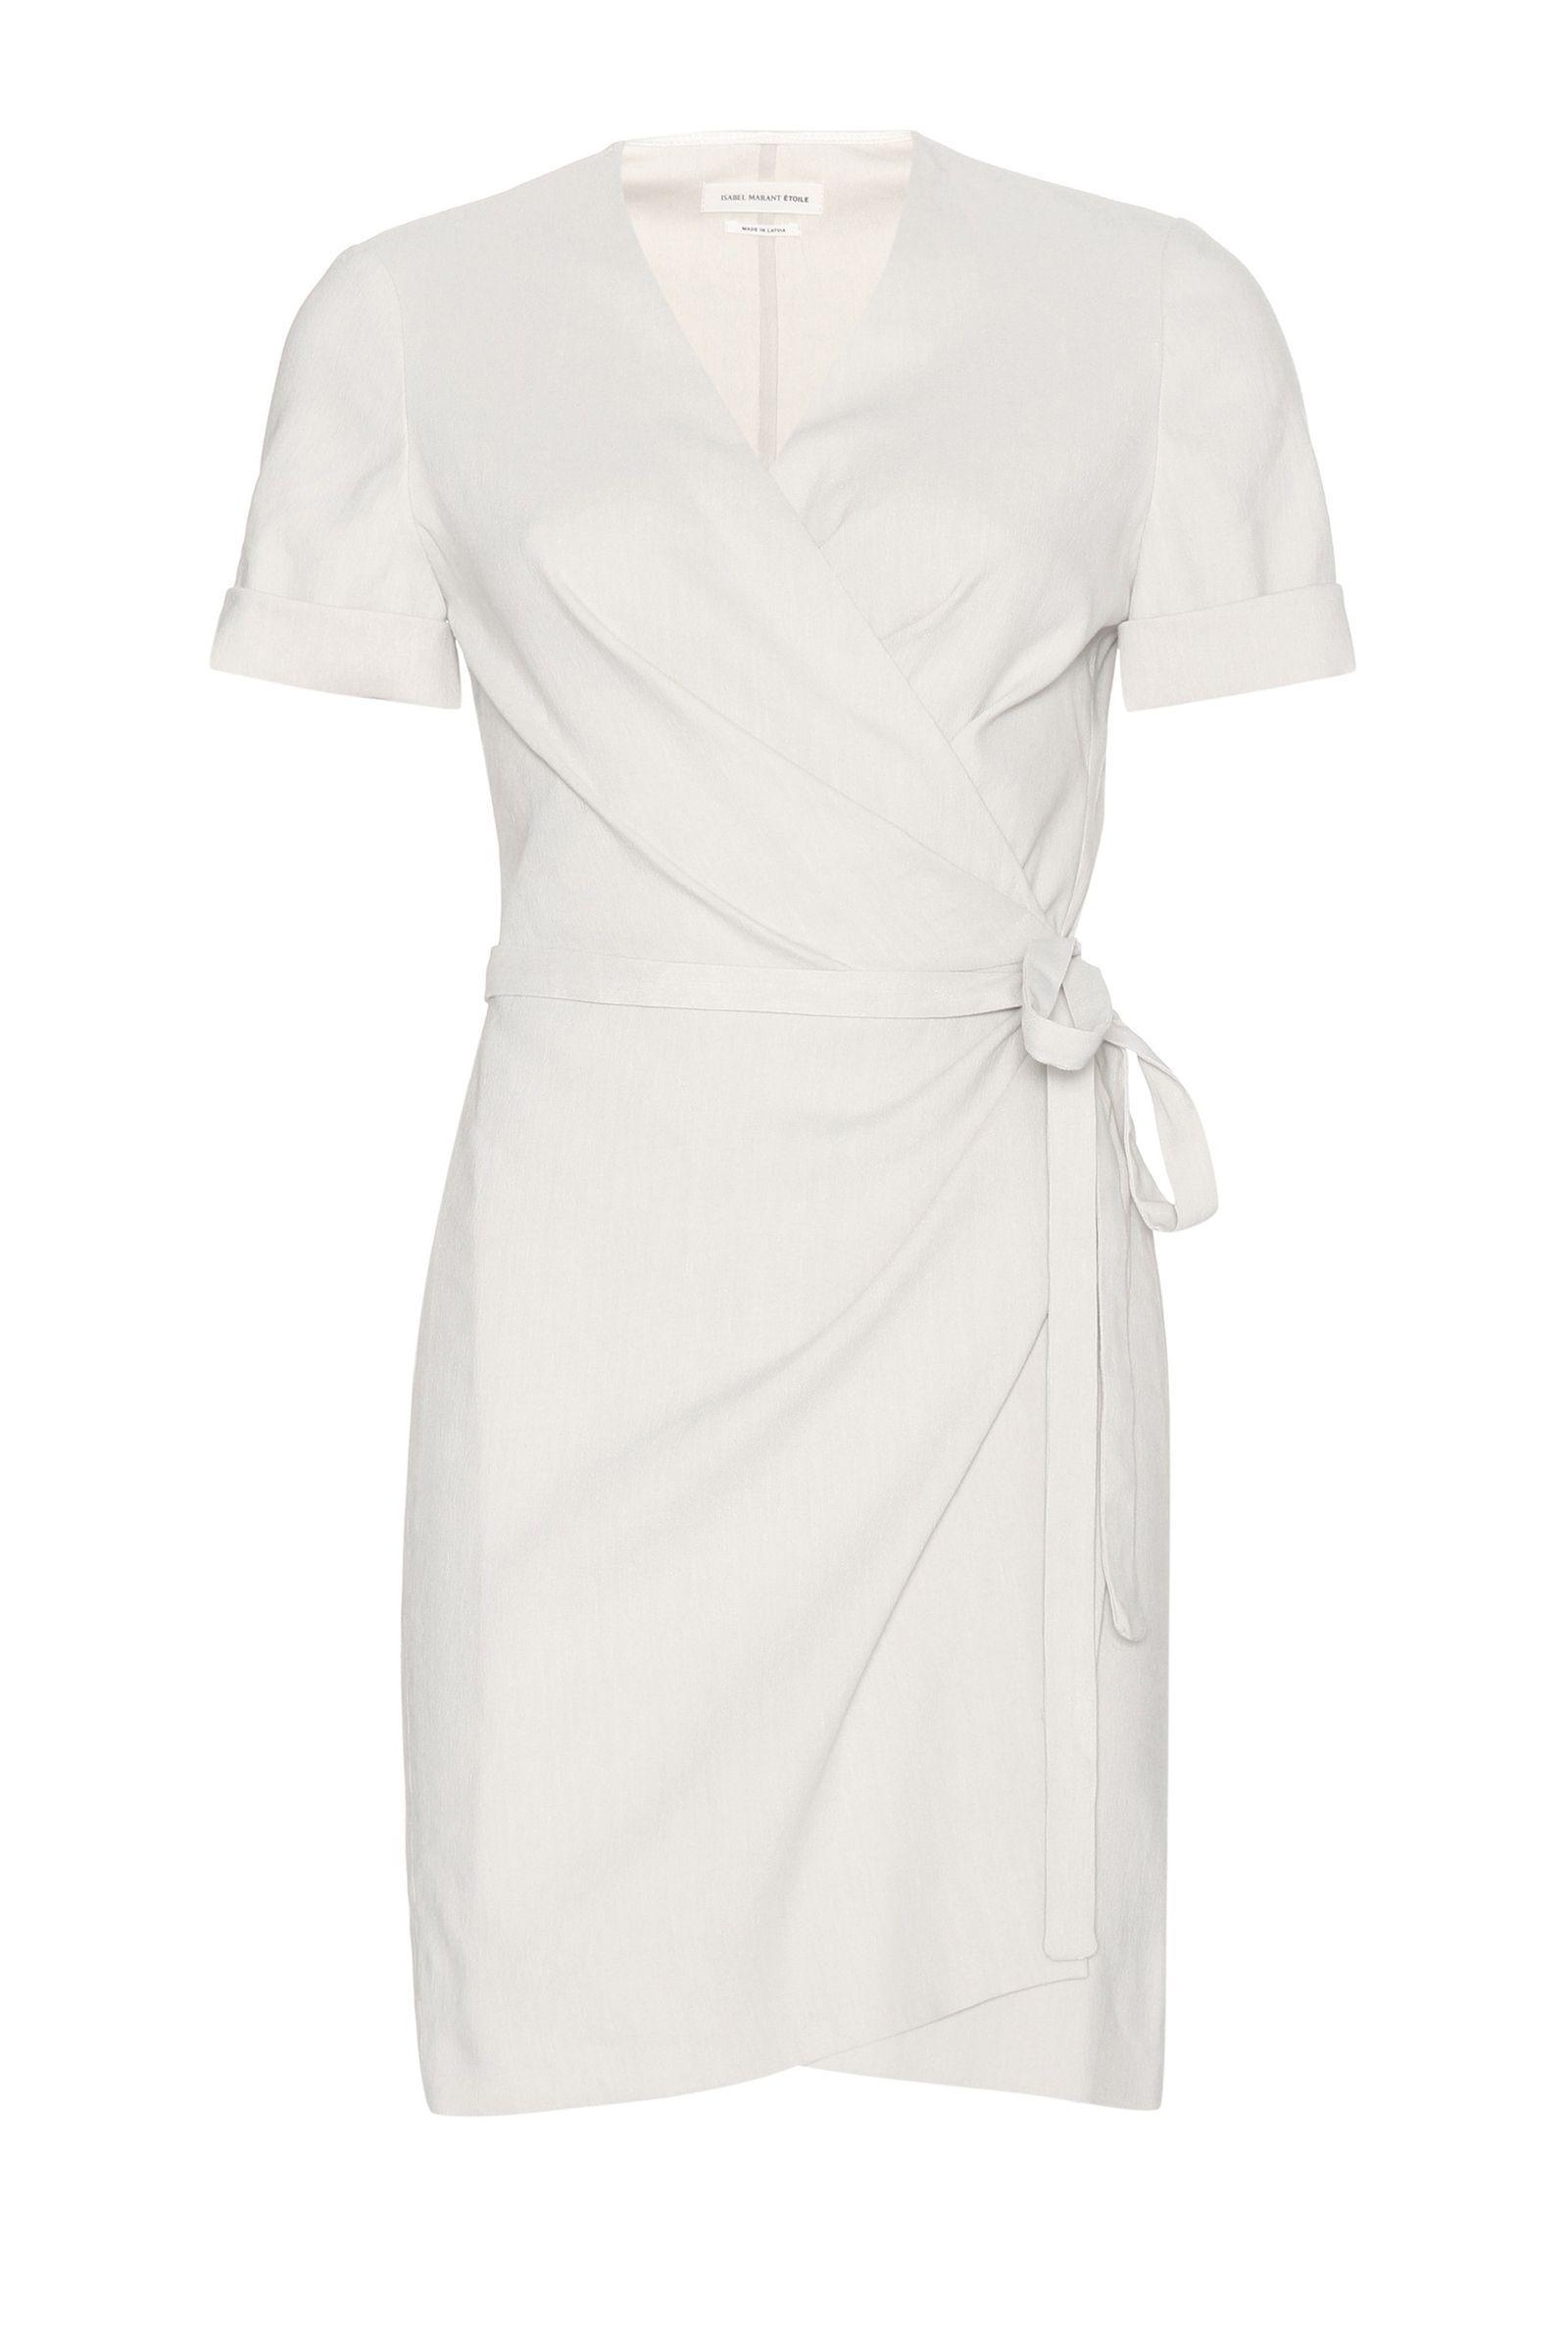 16 Wrap Dresses That Will Take Your Summer Wardrobe To The Next Level Wrap Dress Wrap Around Dress Refashion Clothes [ 2400 x 1600 Pixel ]